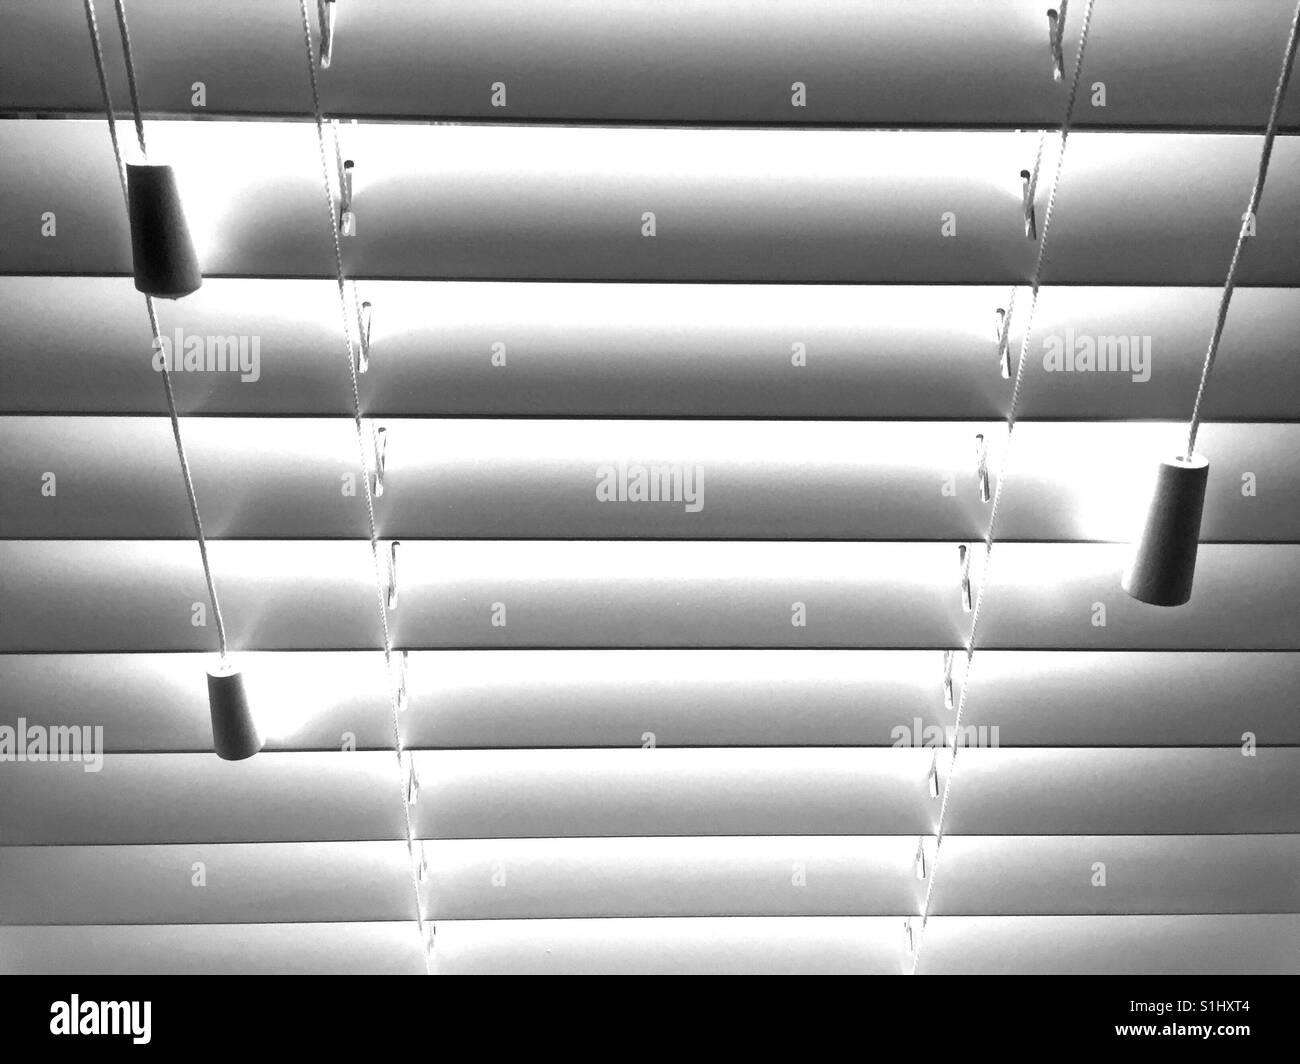 Venetian blinds in the morning - Stock Image